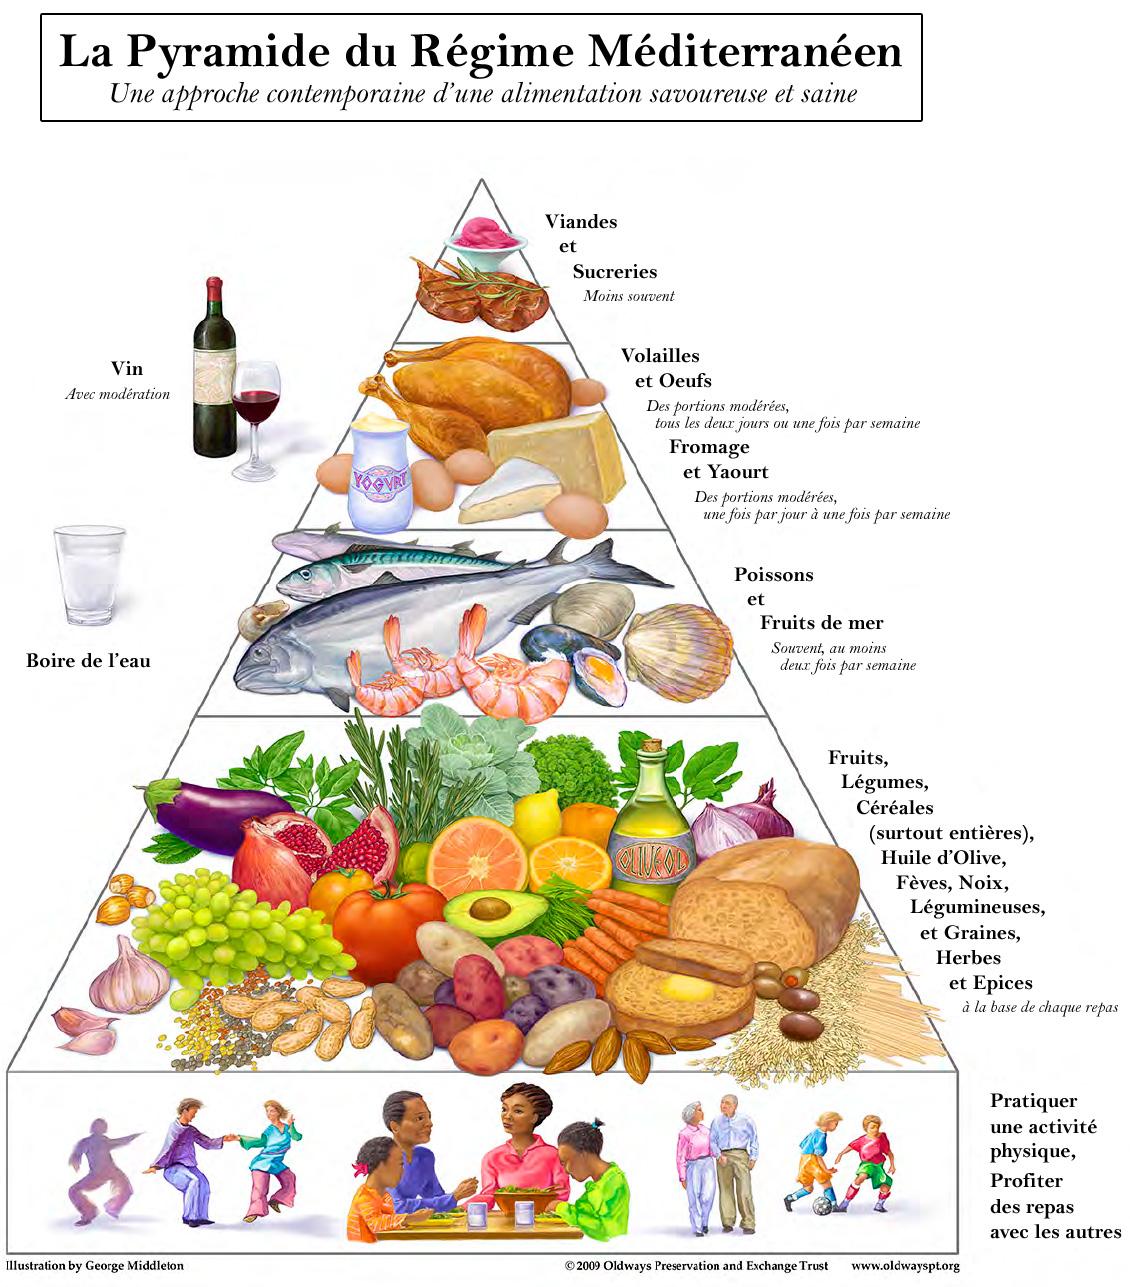 Regime m diterran en recette menu vins de sicile - Recettes cuisine regime mediterraneen ...